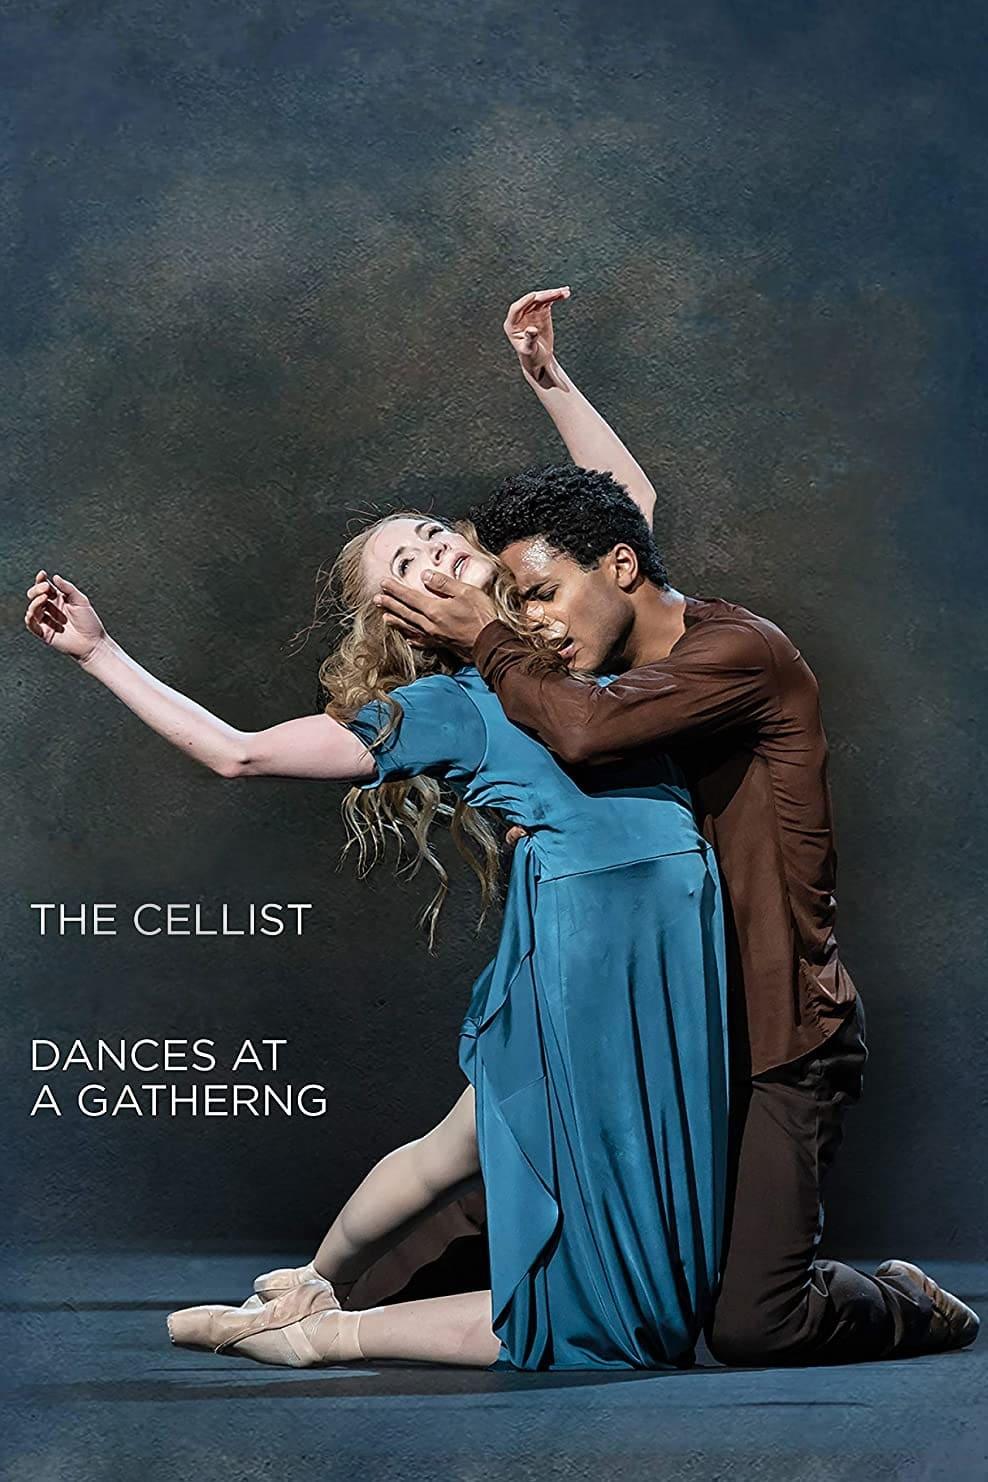 The Cellist / Dances at a Gathering (The Royal Ballet)